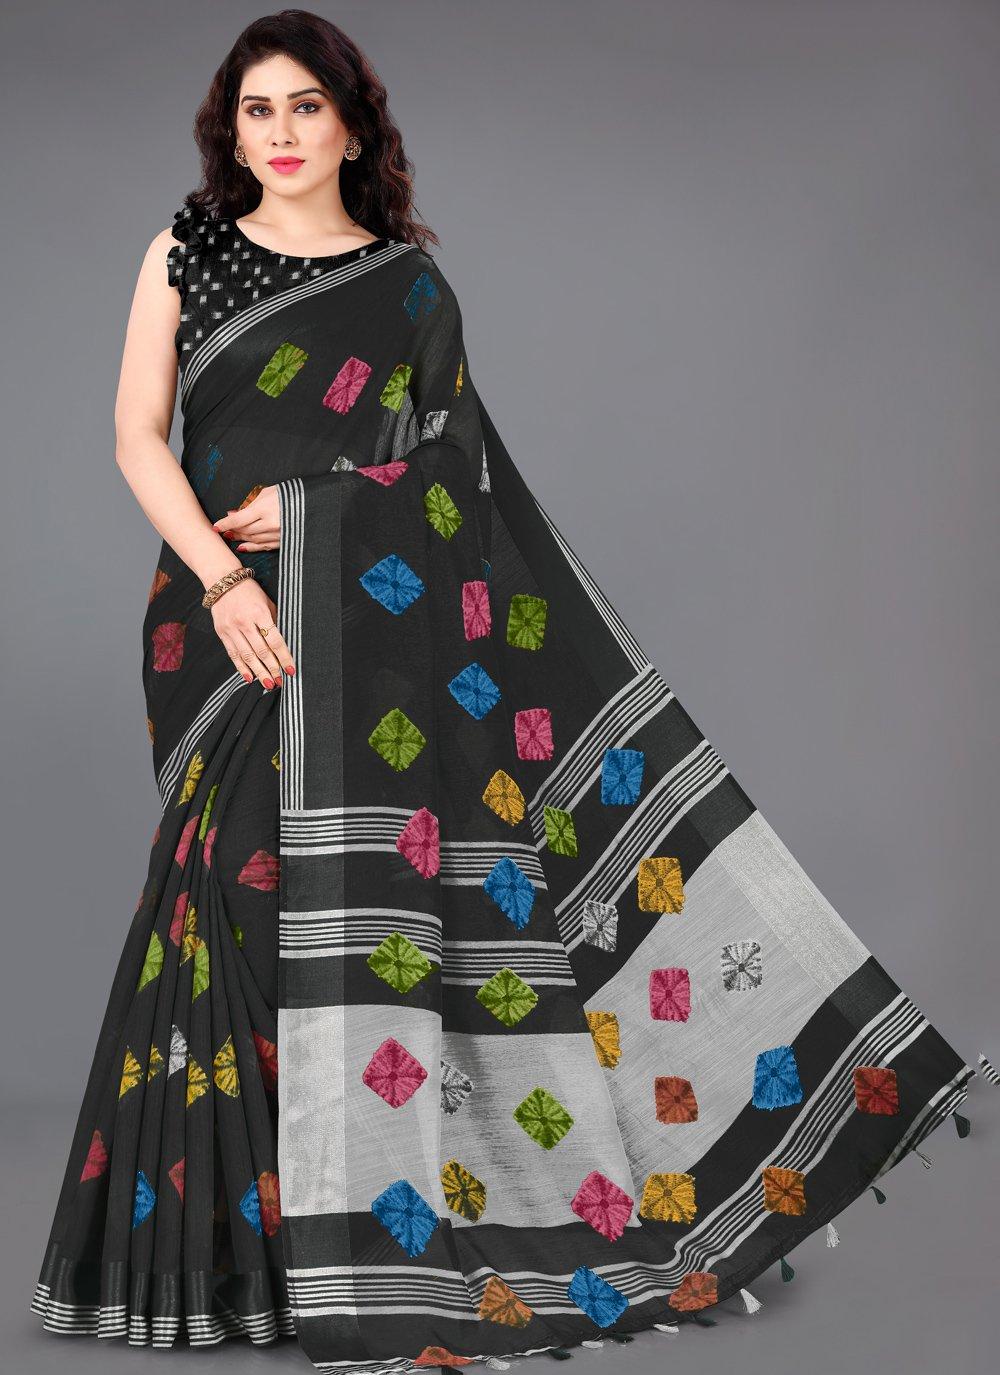 Printed Cotton Classic Saree in Black